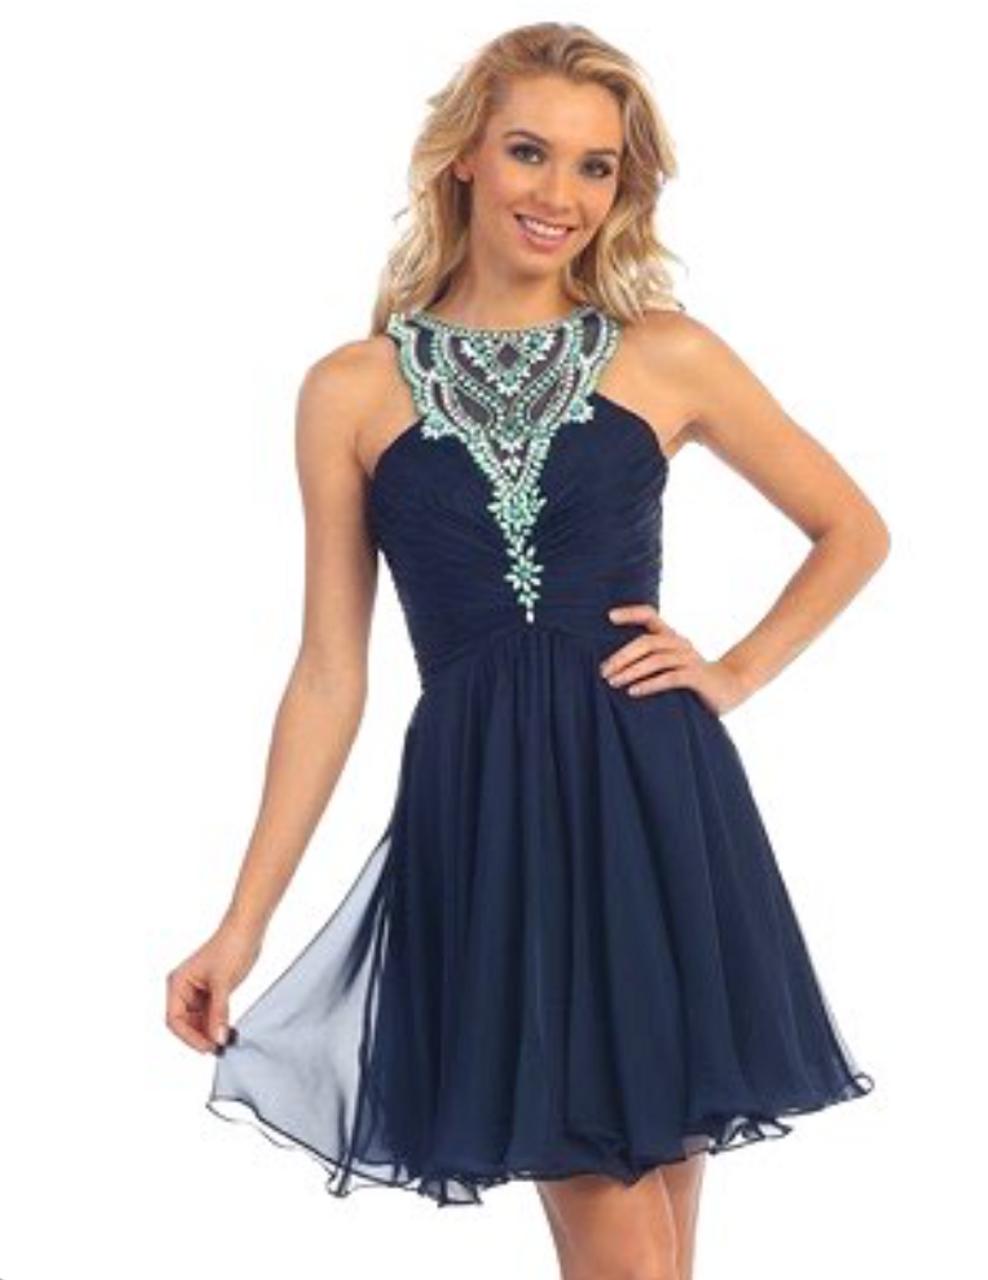 Halter Short Homecoming Dresses